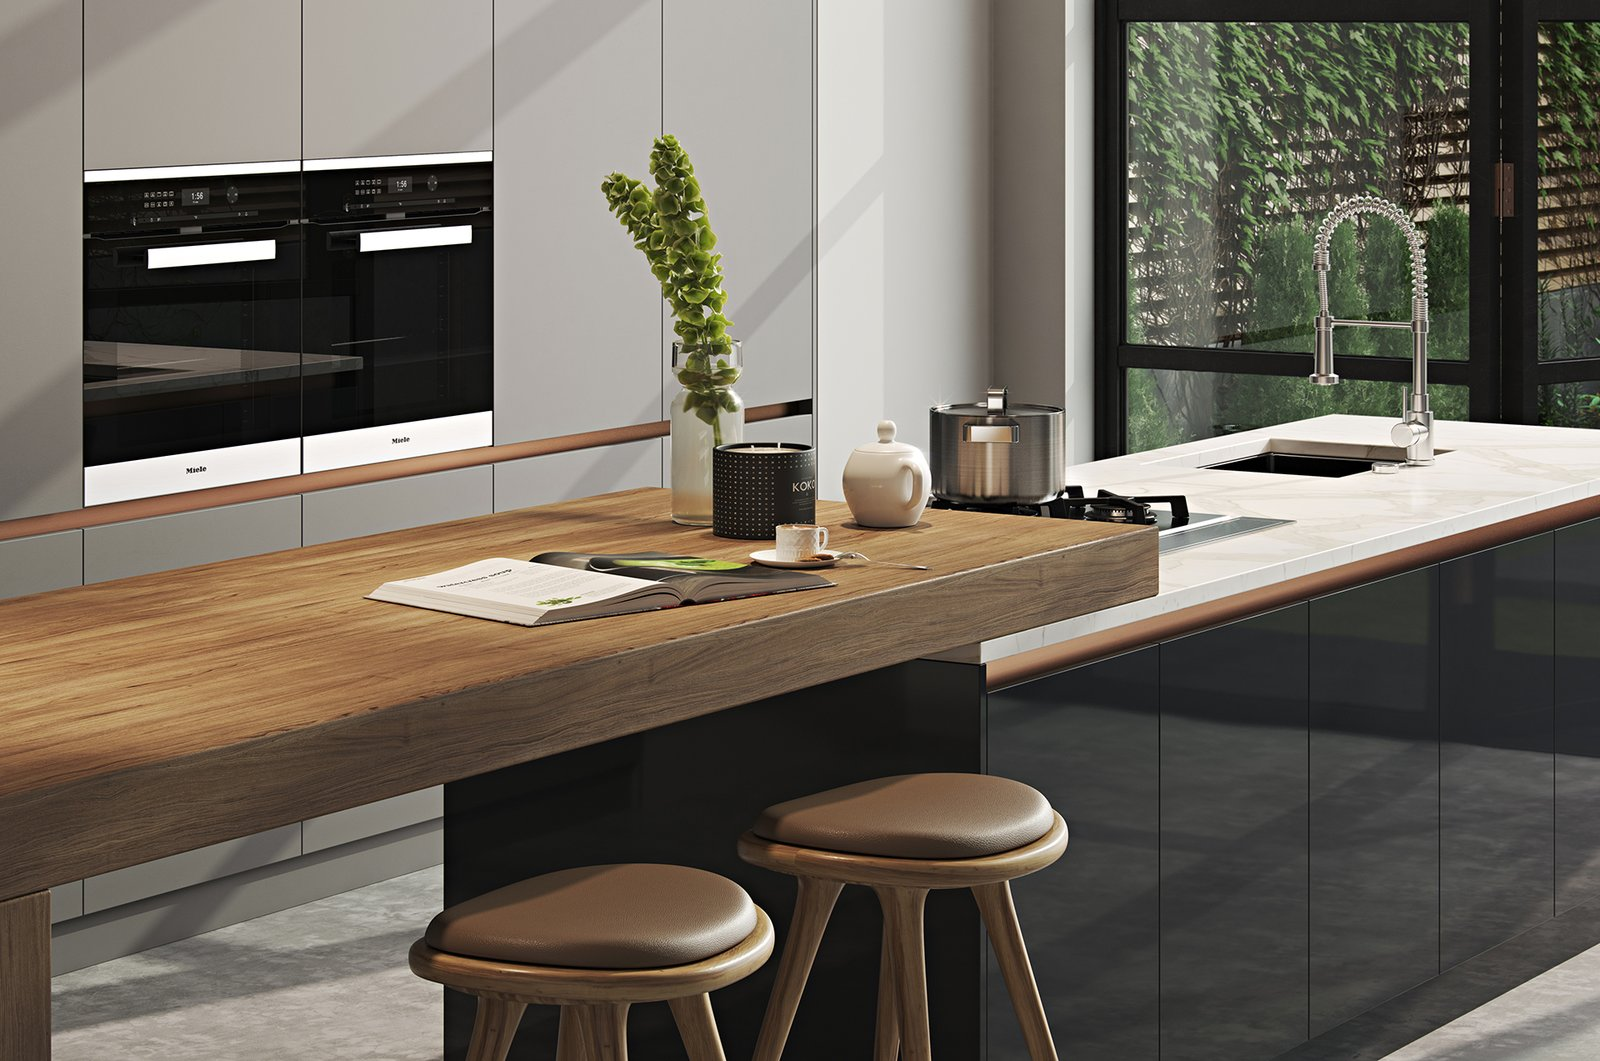 Kitchen, Laminate Cabinet, Marble Counter, Concrete Floor, Wall Oven, Range, and Undermount Sink  Kitchen//Extension by Mitaka DImov